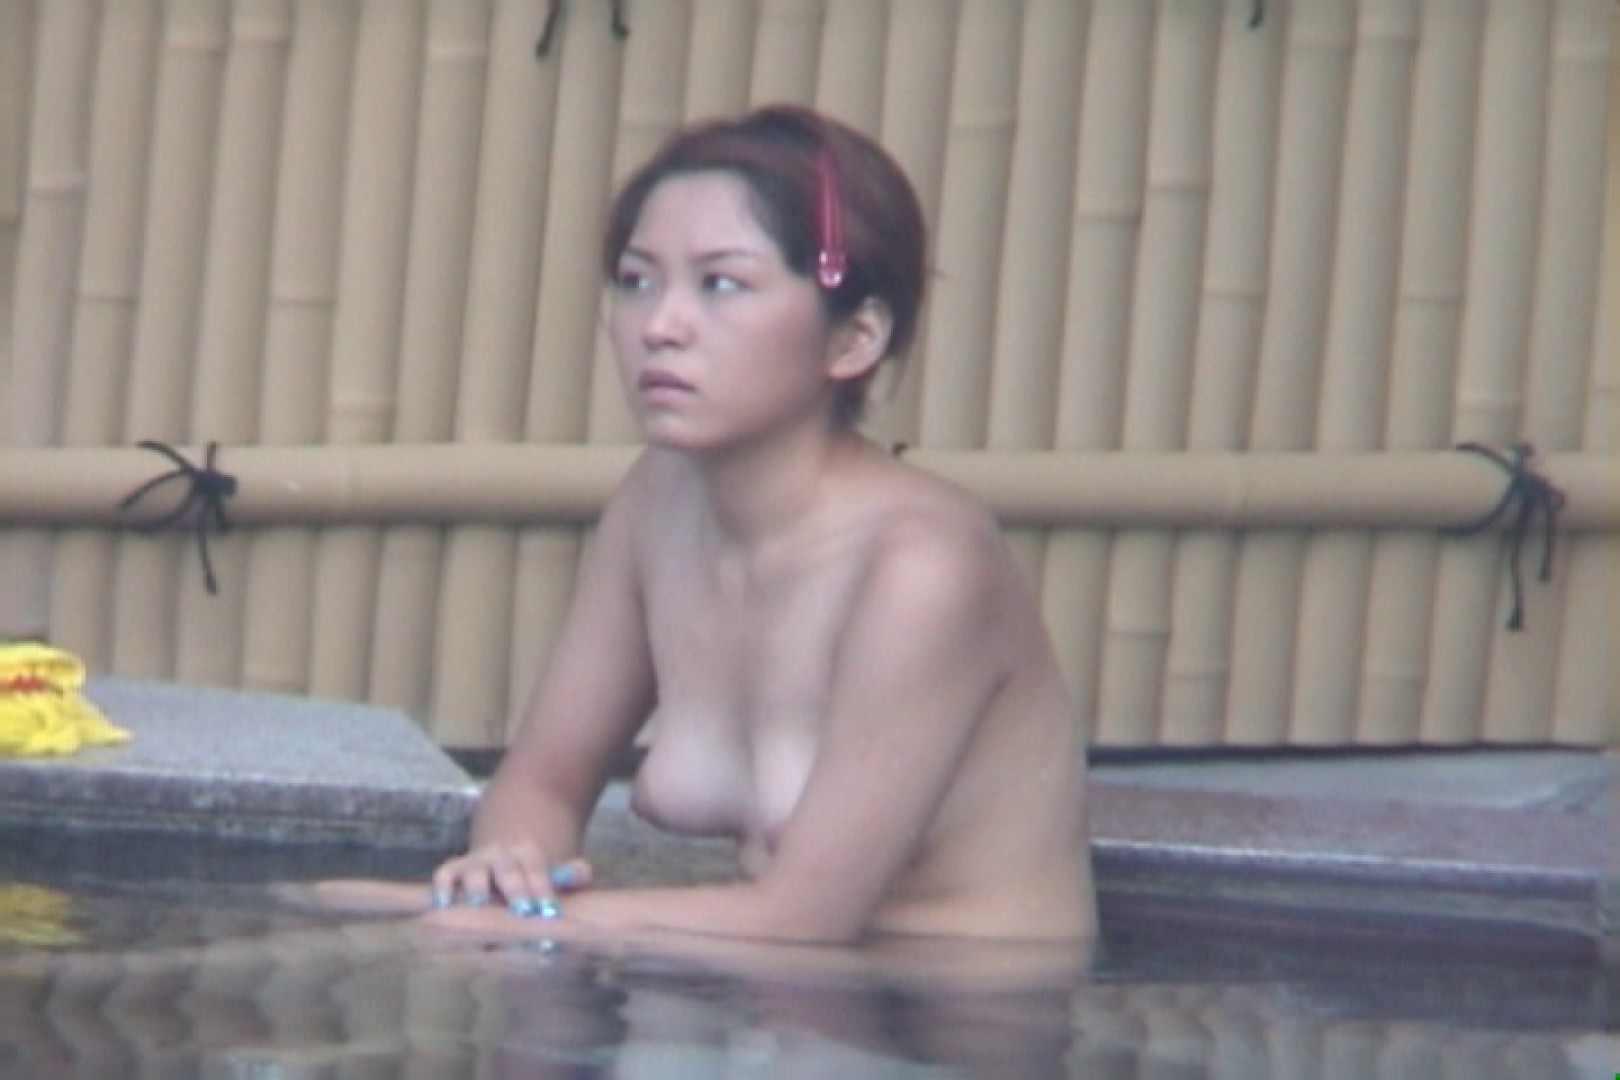 Aquaな露天風呂Vol.574 0 | 0  81連発 53